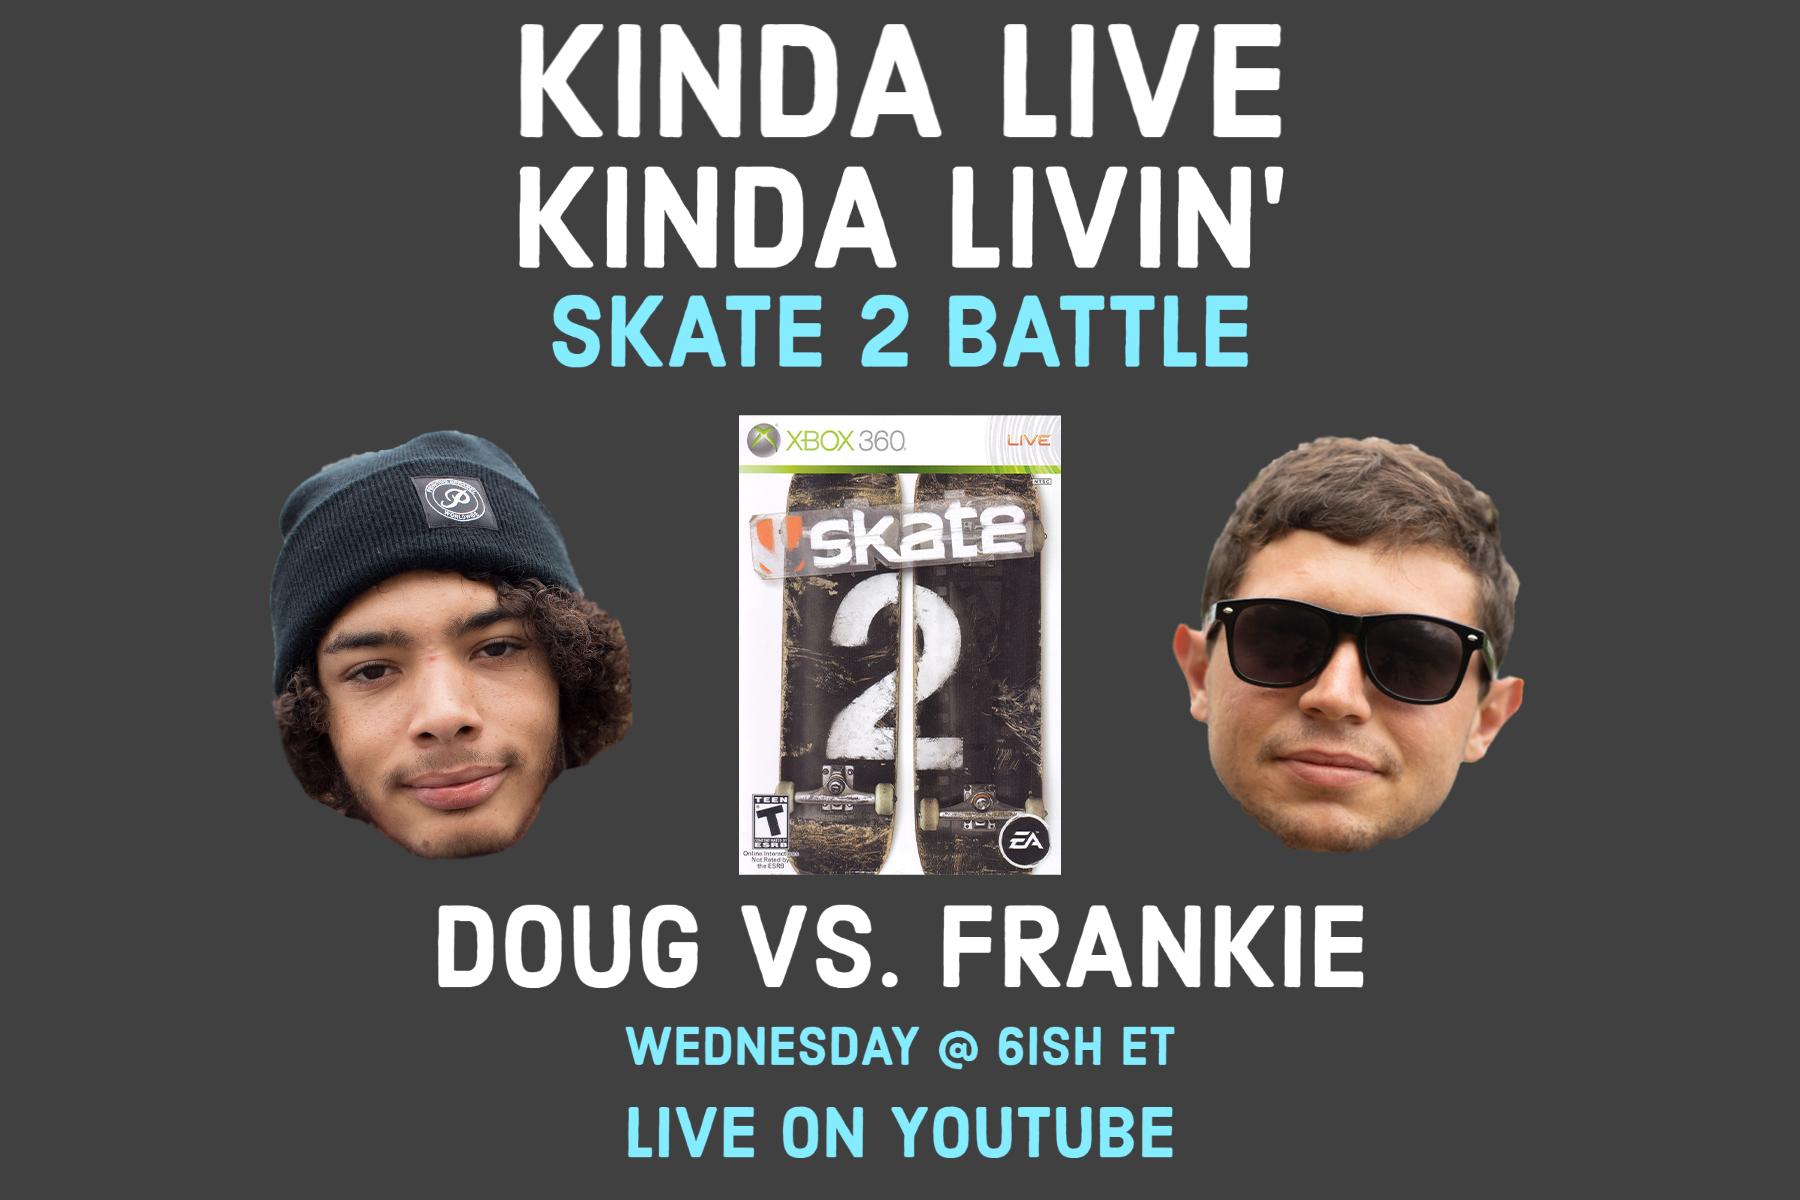 Ep. 53: Skate 2 Battle | Kinda Live Kinda Livin' Podcast